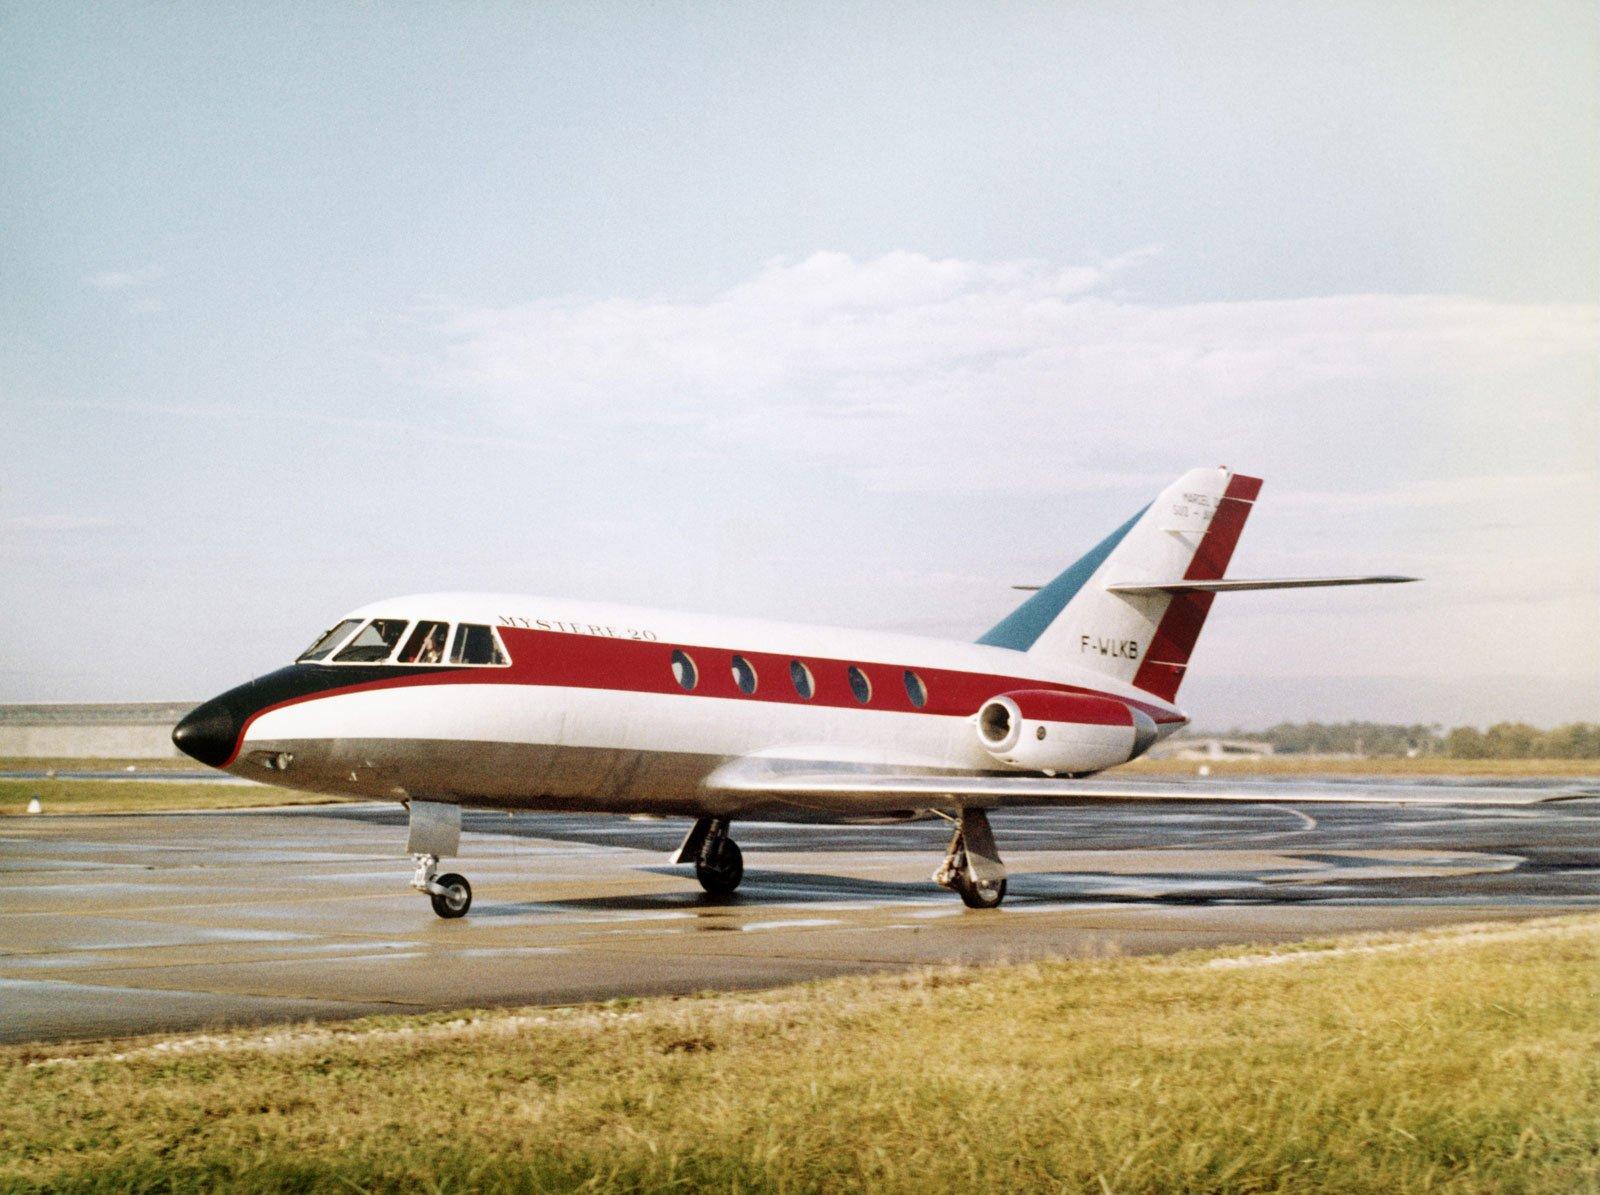 Mystre Falcon 20 200 Origins Characteristics And Performance Data Jet Aircraft Sound Generator Circuit Schematic